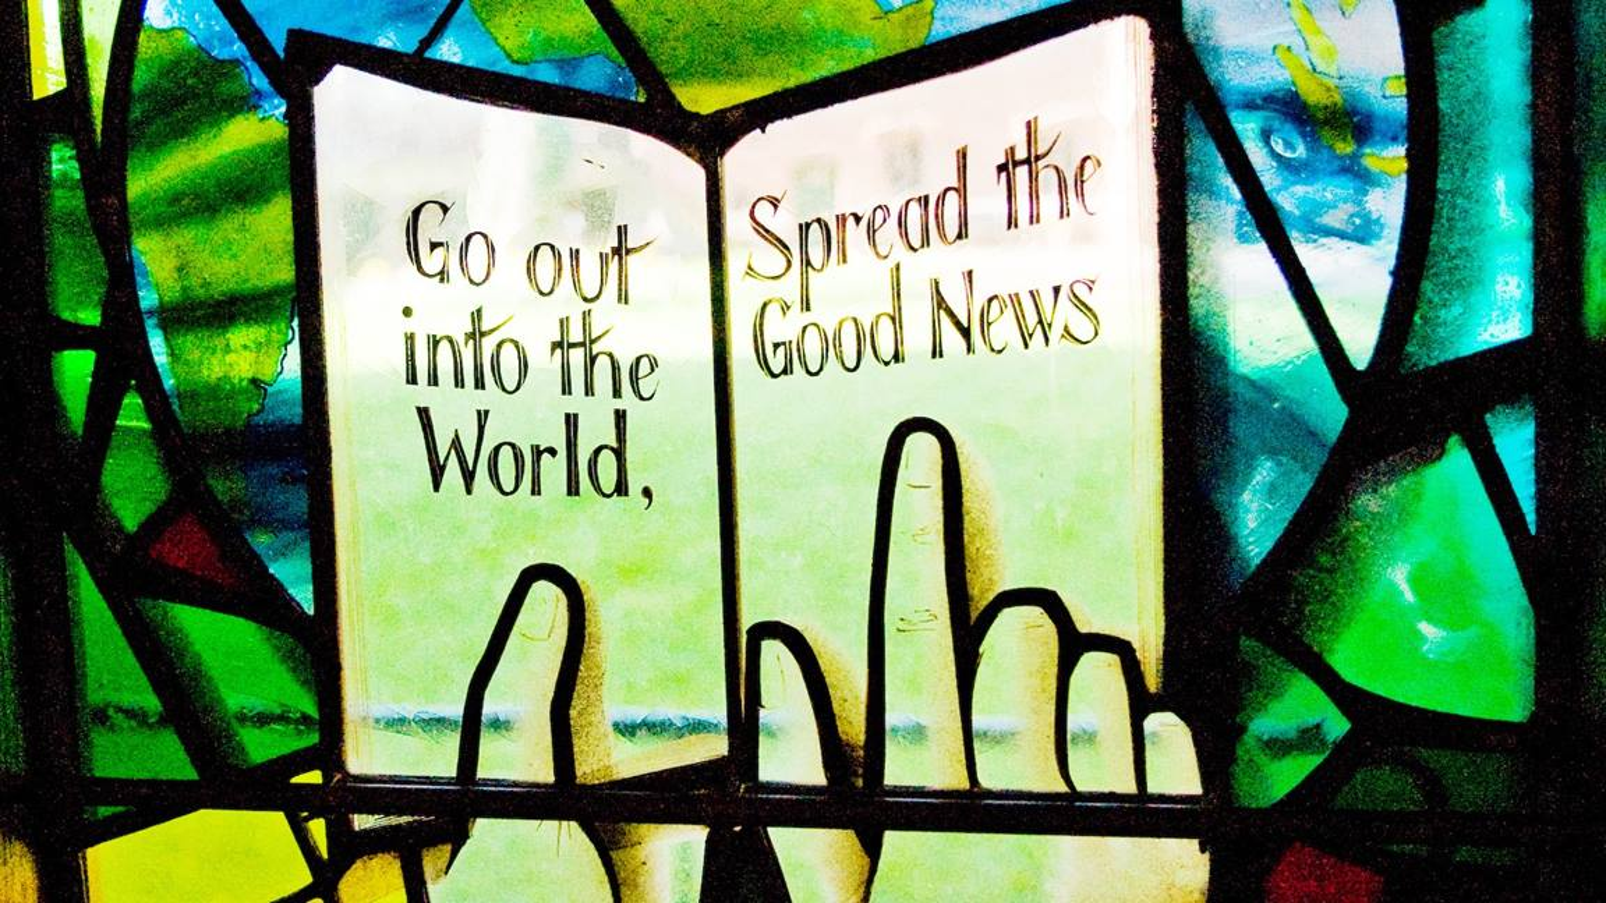 How do we share the good news?